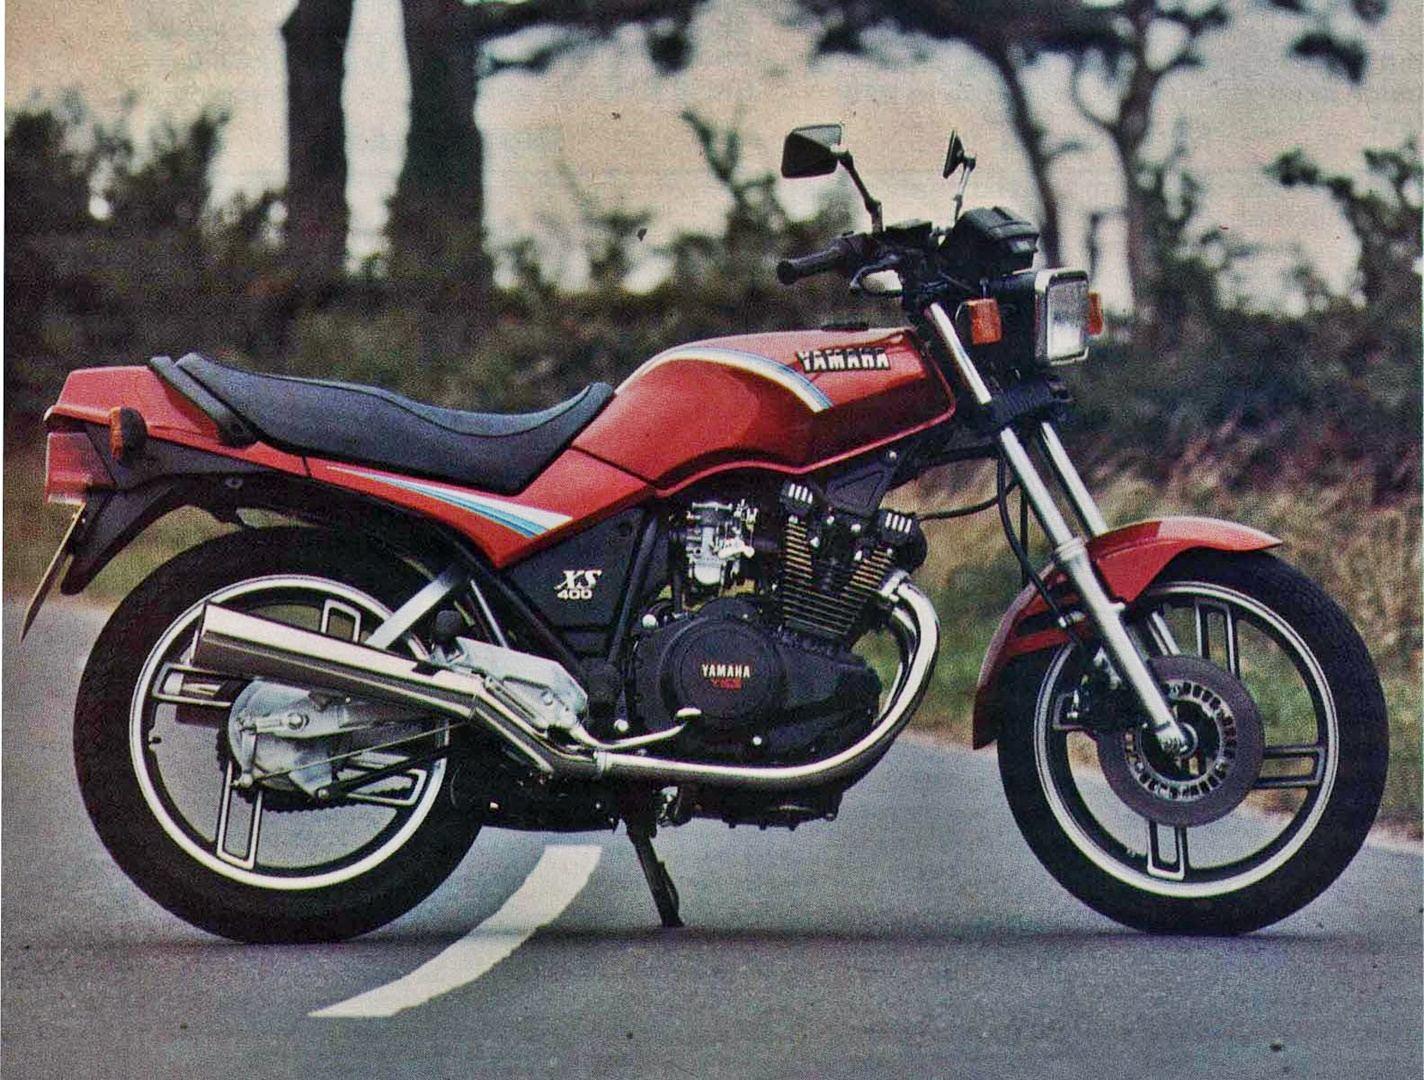 Moto del día: Yamaha XS 400